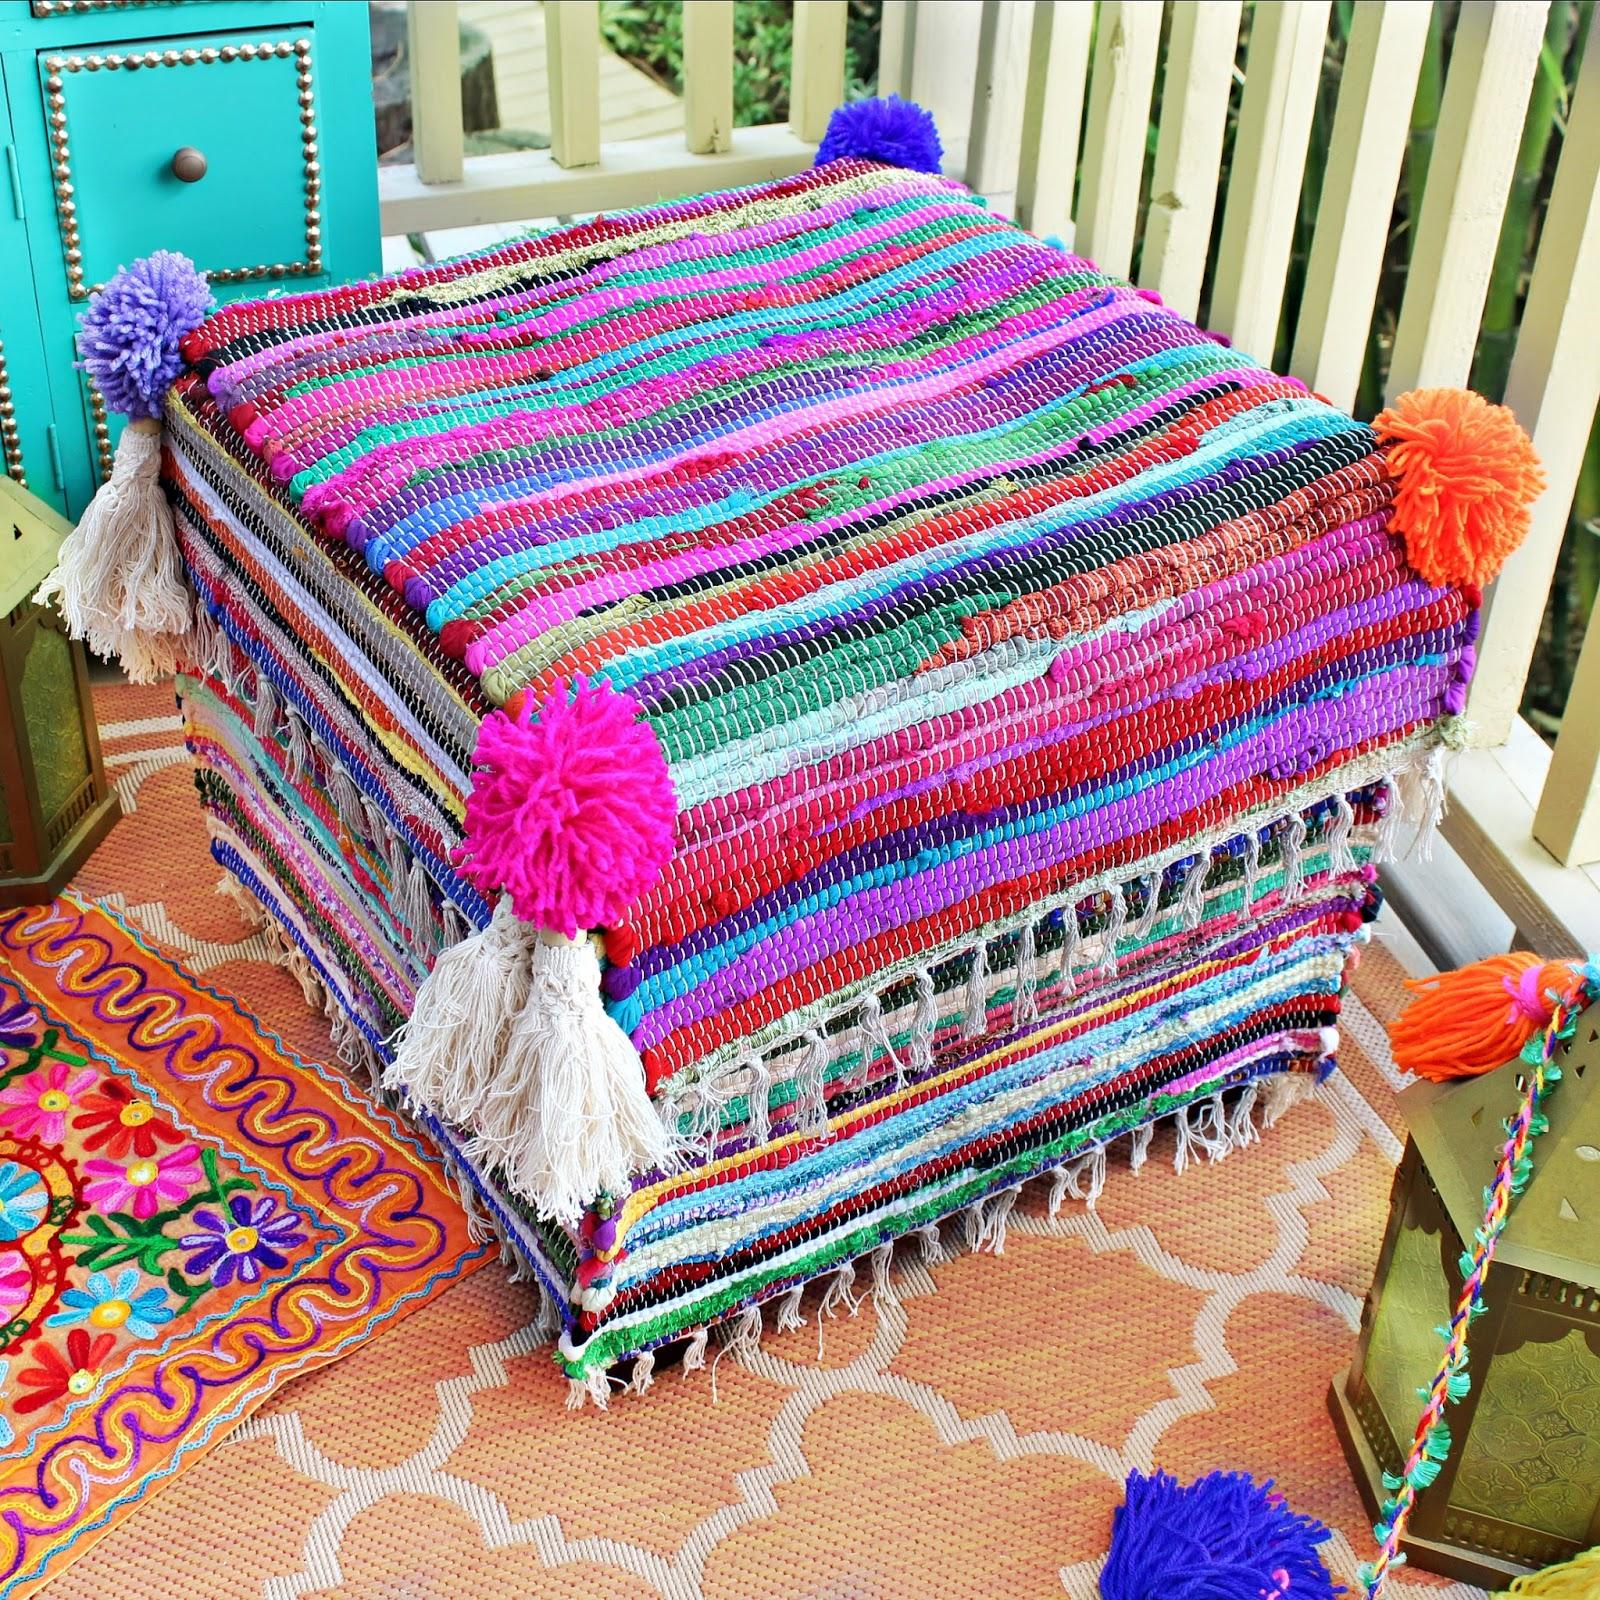 Sensational Mark Montano No Sew Rag Rug Ottoman Makeover Machost Co Dining Chair Design Ideas Machostcouk